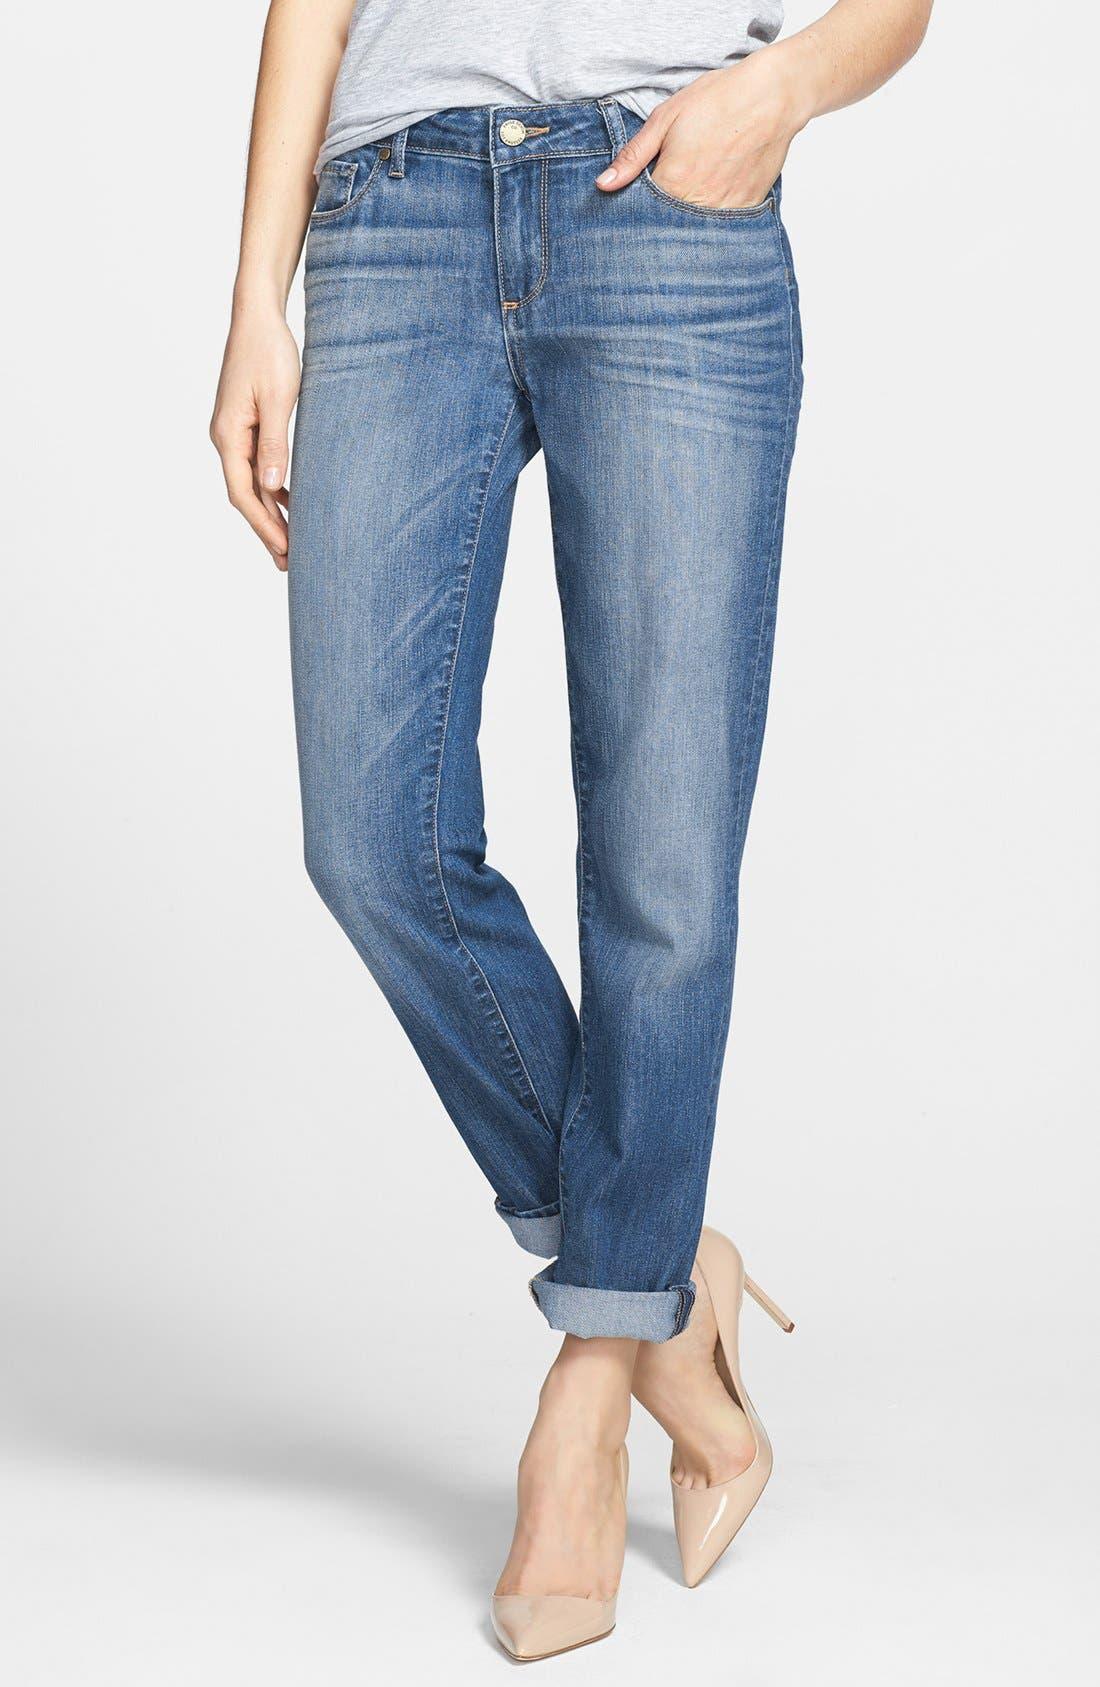 Alternate Image 1 Selected - Paige Denim 'Jimmy Jimmy' Skinny Boyfriend Jeans (Aero)